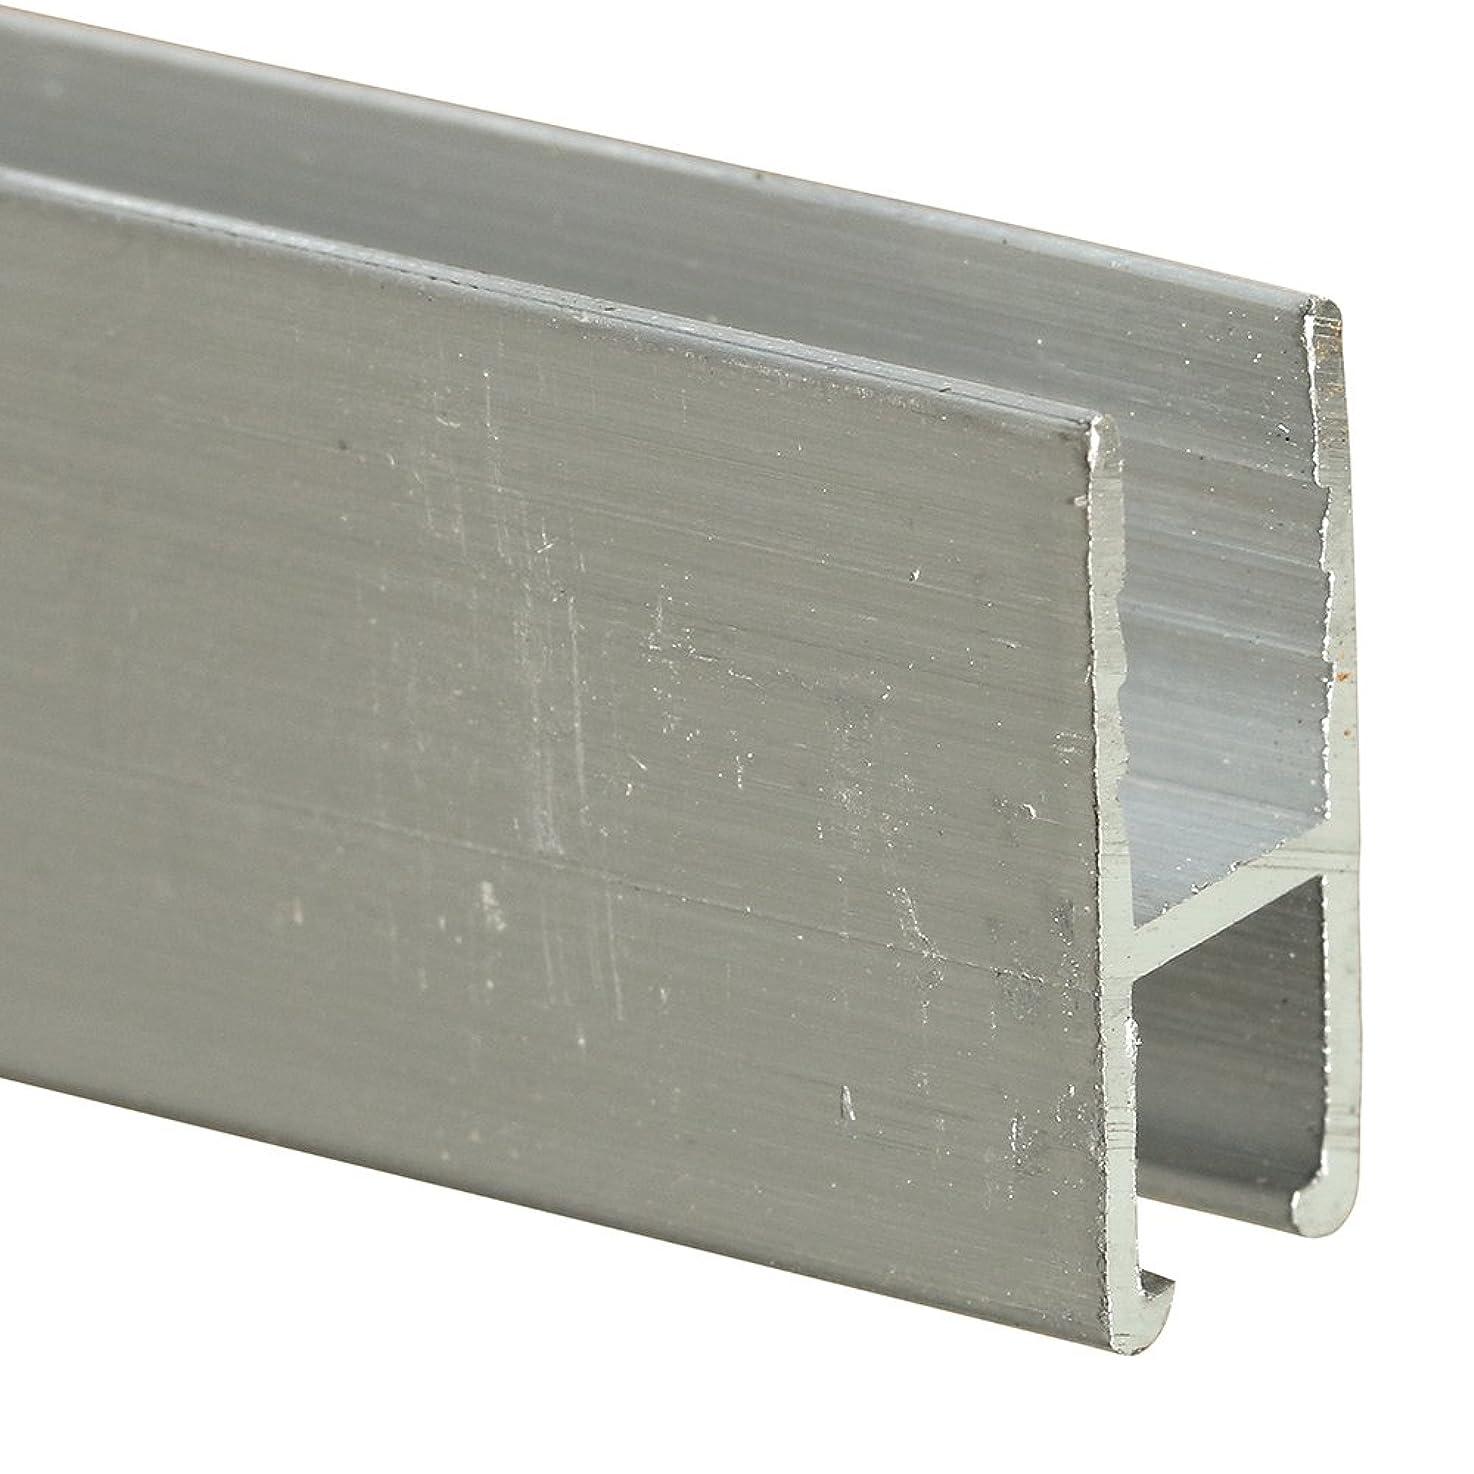 Prime-Line Products F 2637 Sliding Window Sash Frame, 6-Feet, Aluminum